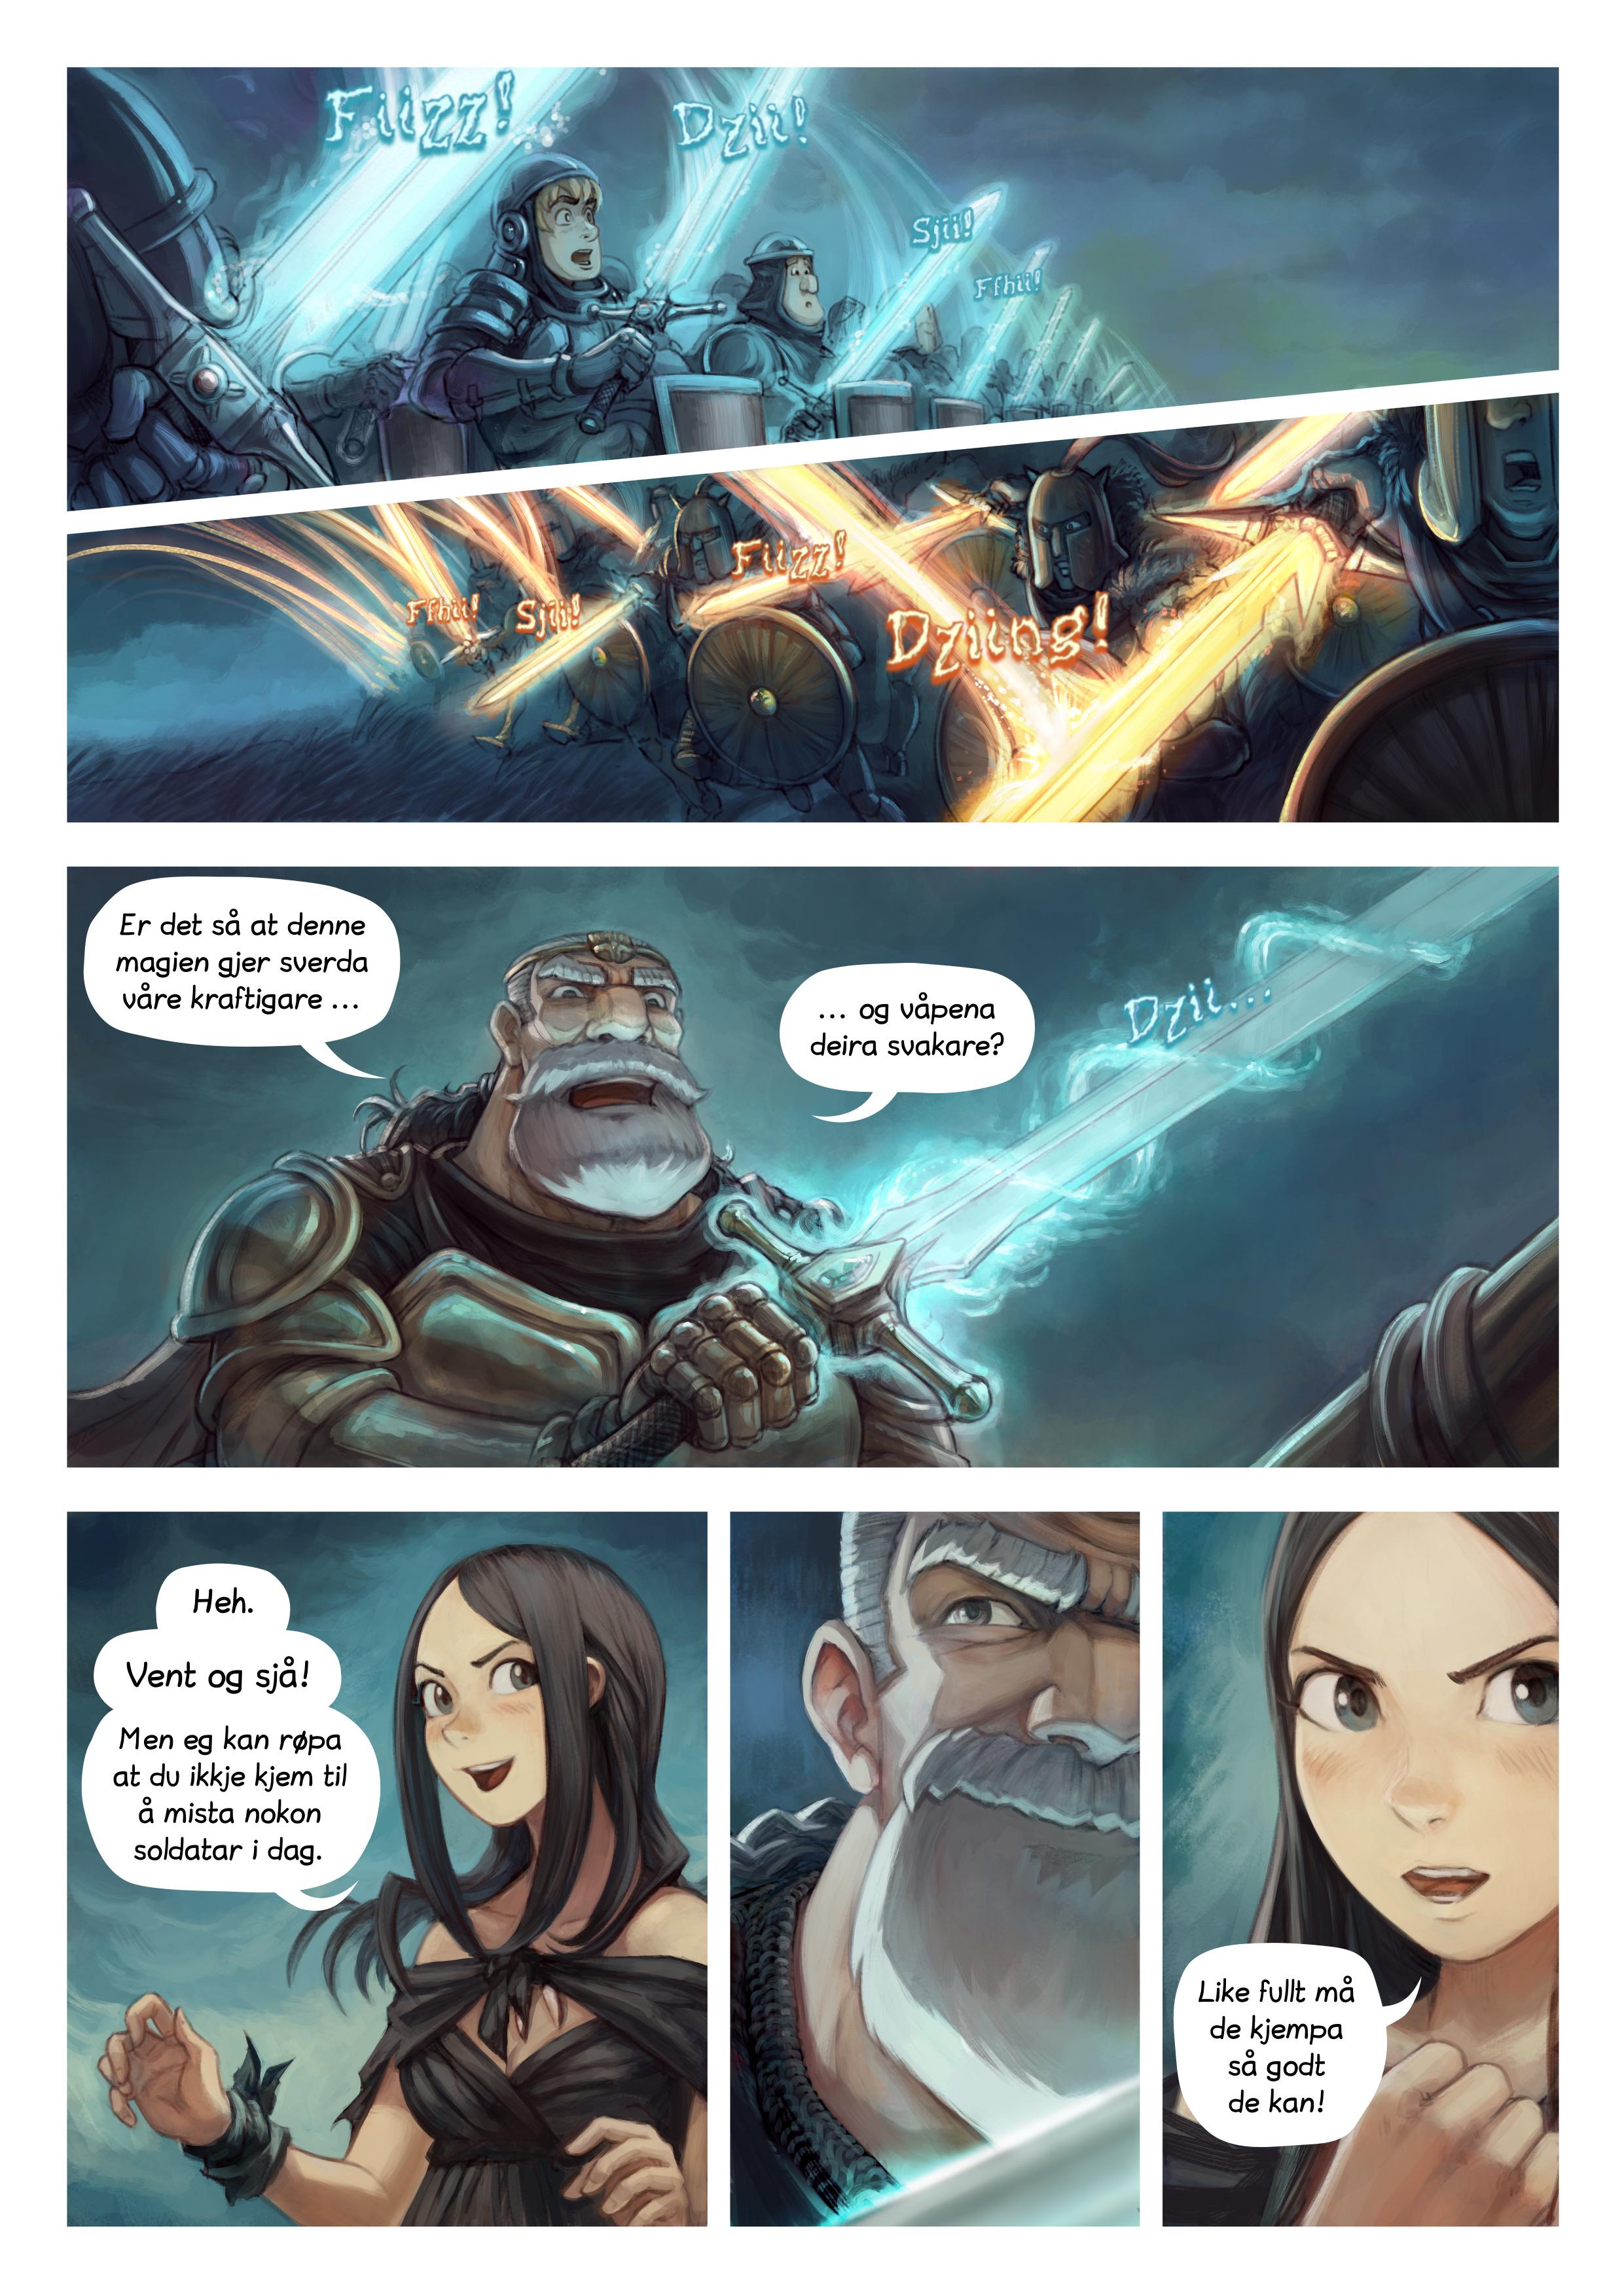 Episode 33: Krigsmagi, Side 3